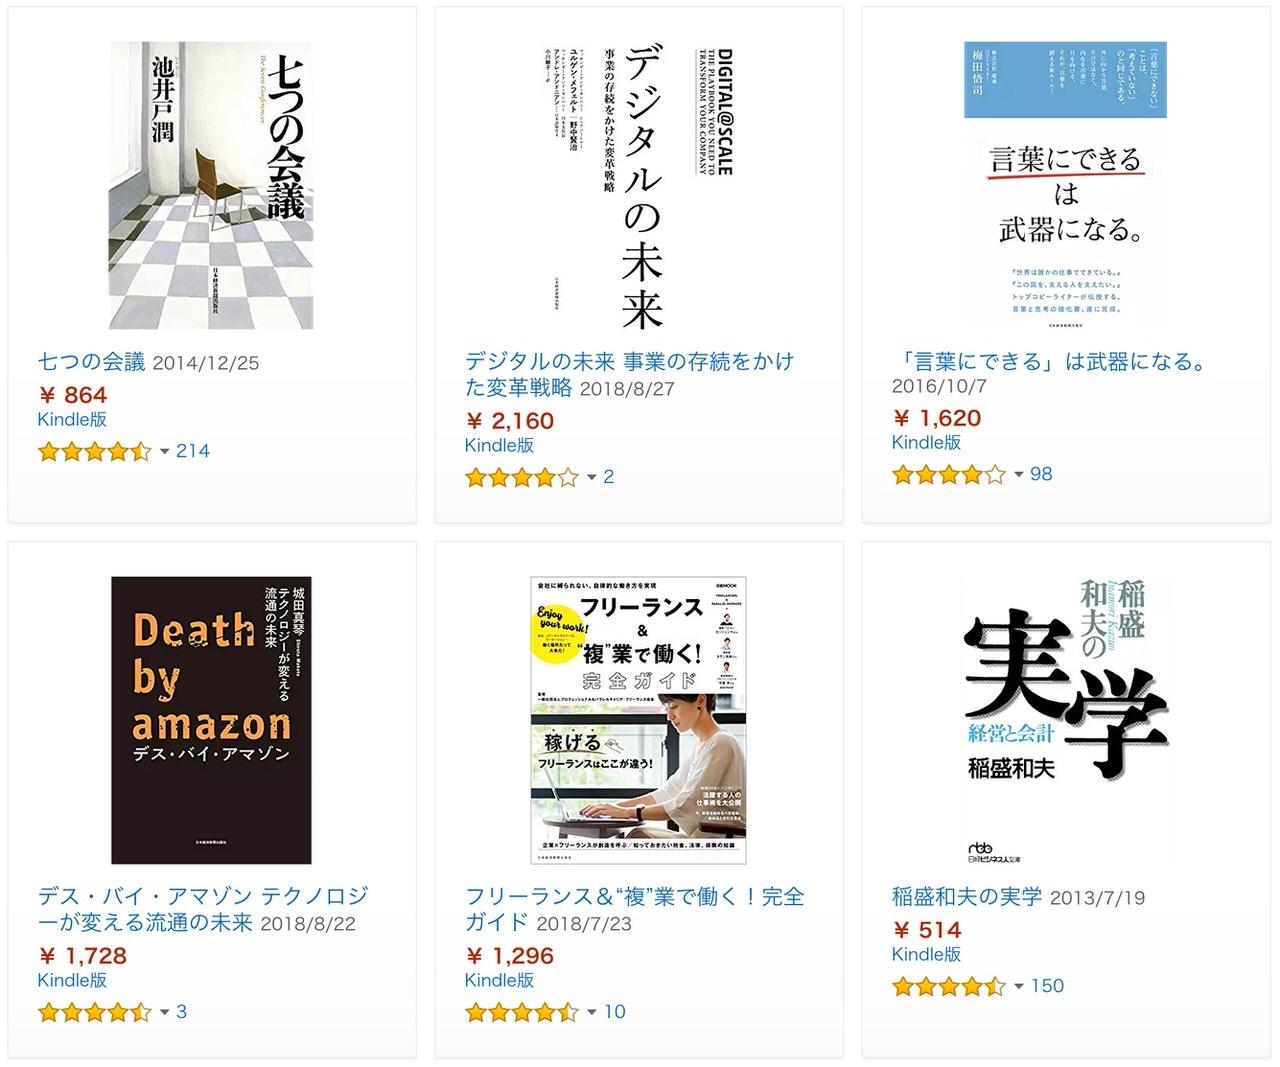 【Kindleセール】850冊対象「日本経済新聞出版 50%ポイント還元」セール開催中(10/11まで)